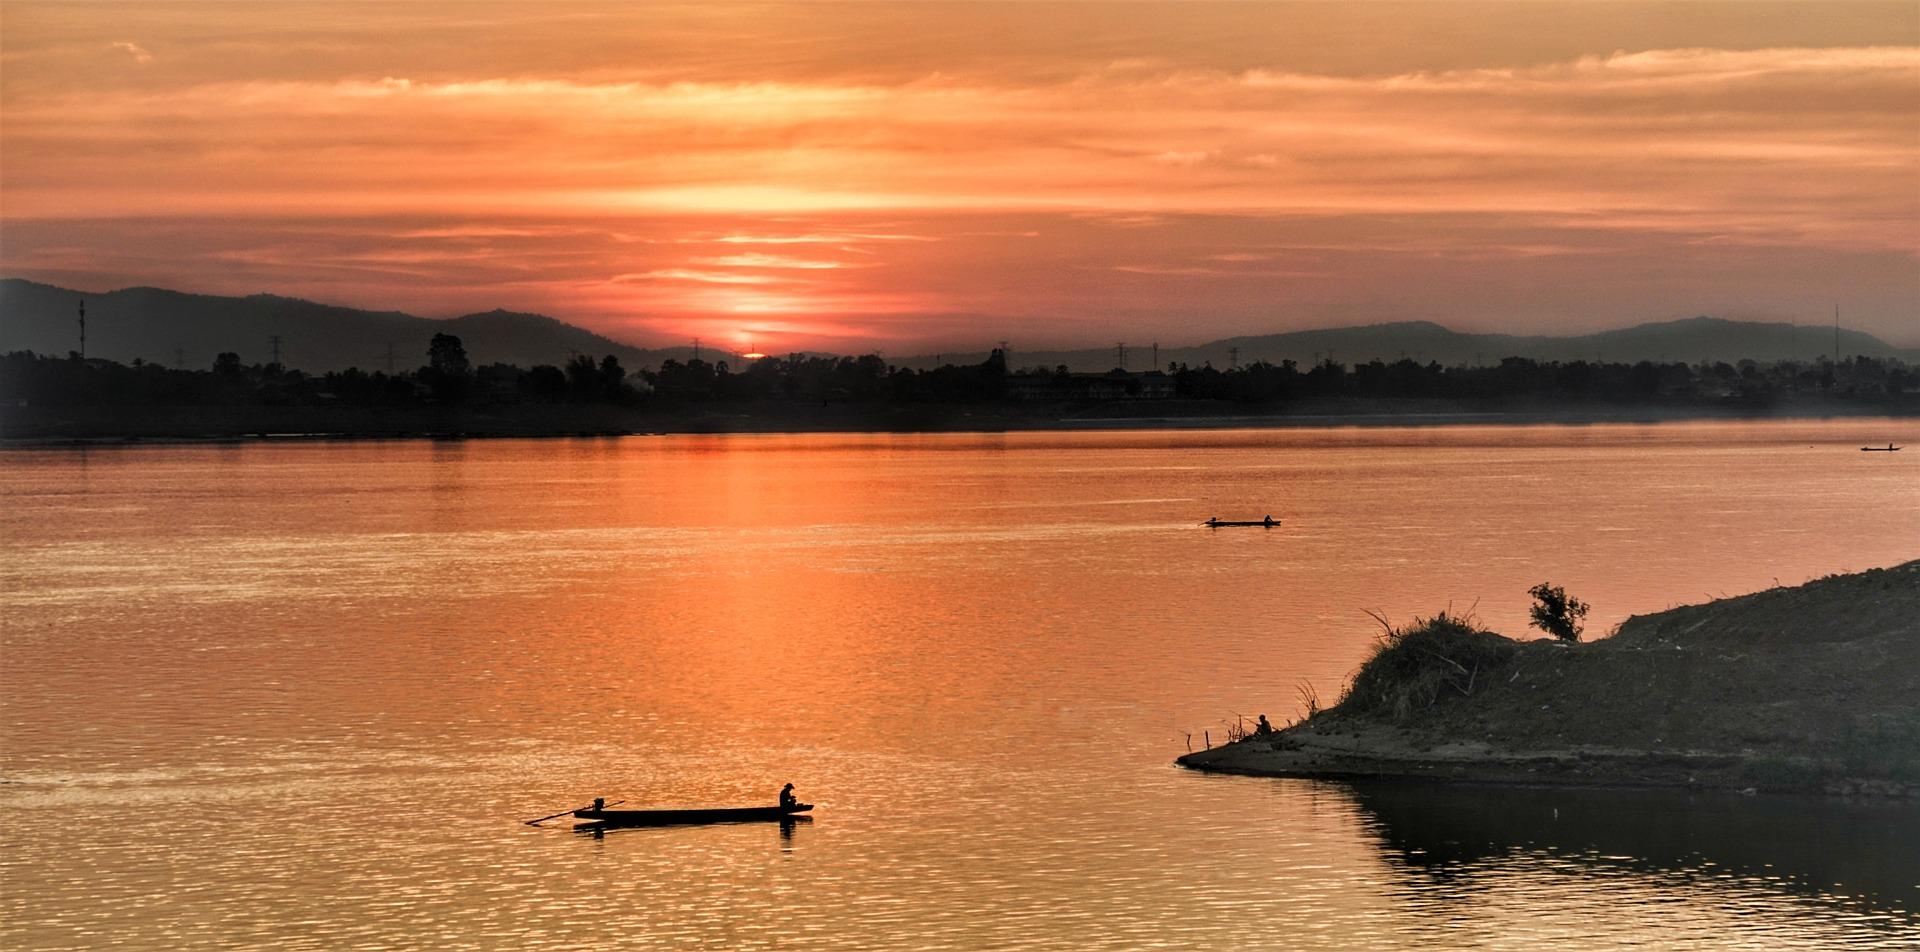 Marilena Pepe Consulente di viaggi Mekong Asia